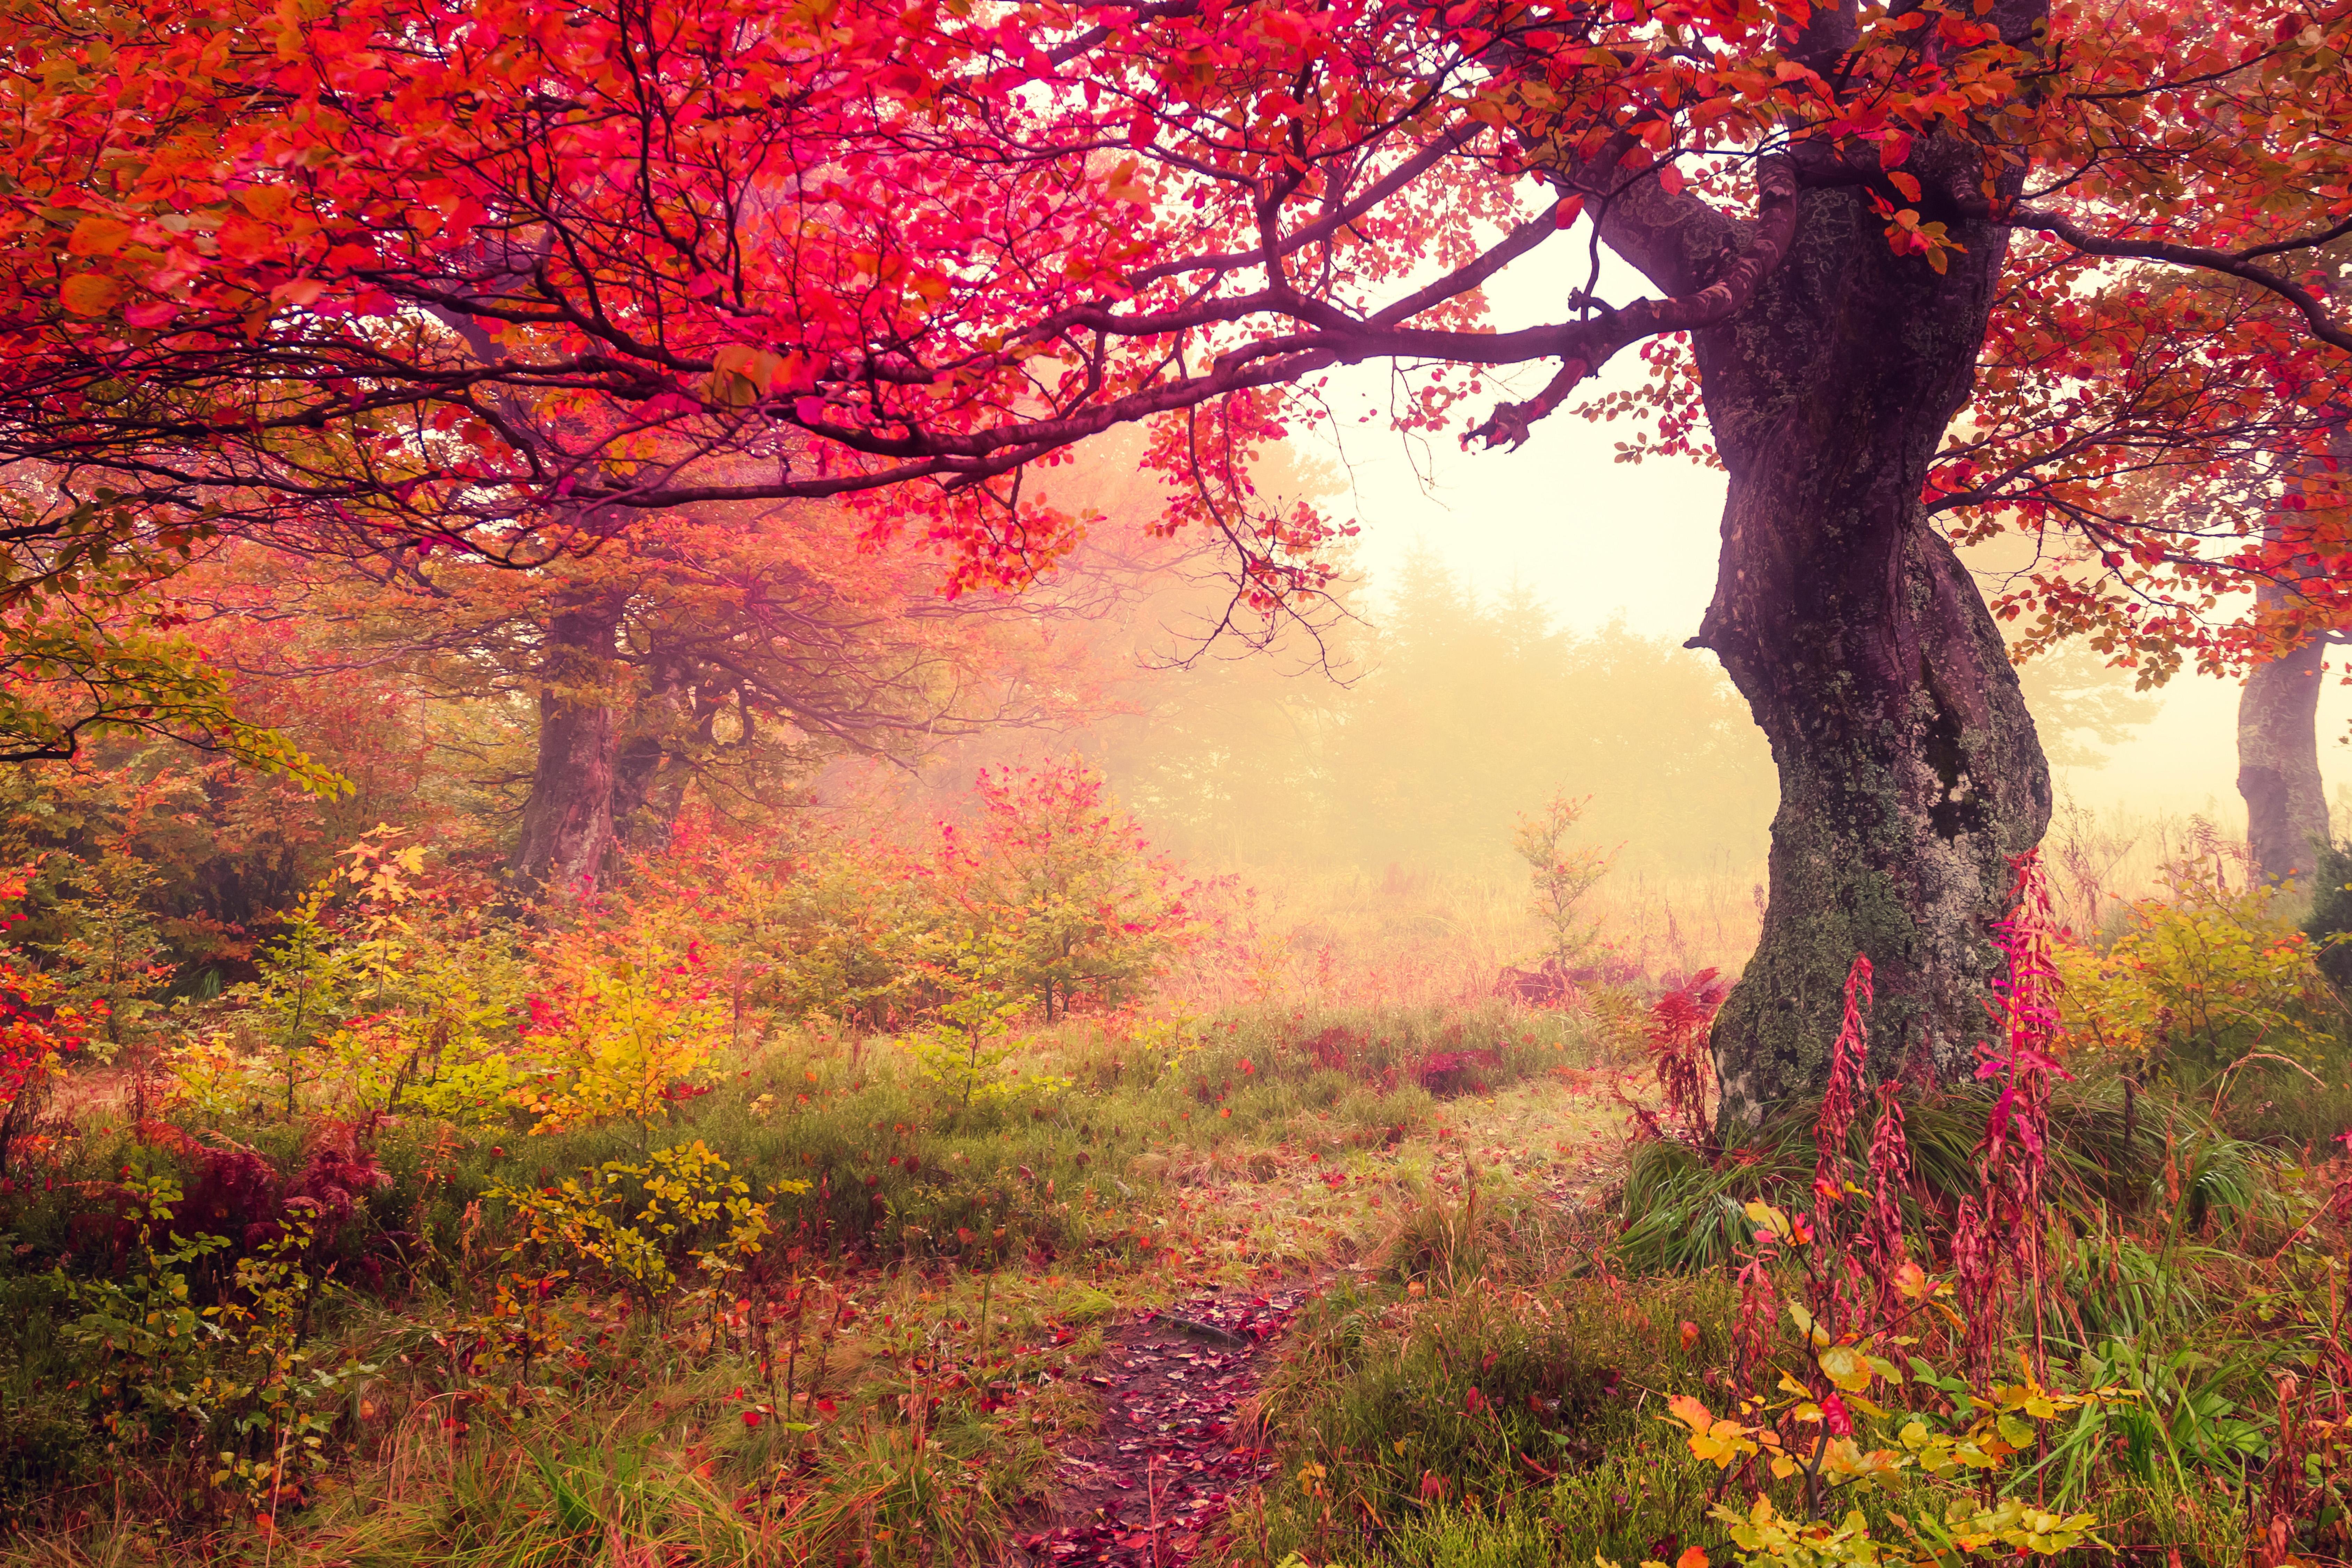 Autumn Landscape With Fog Scenery Image Free Stock Photo